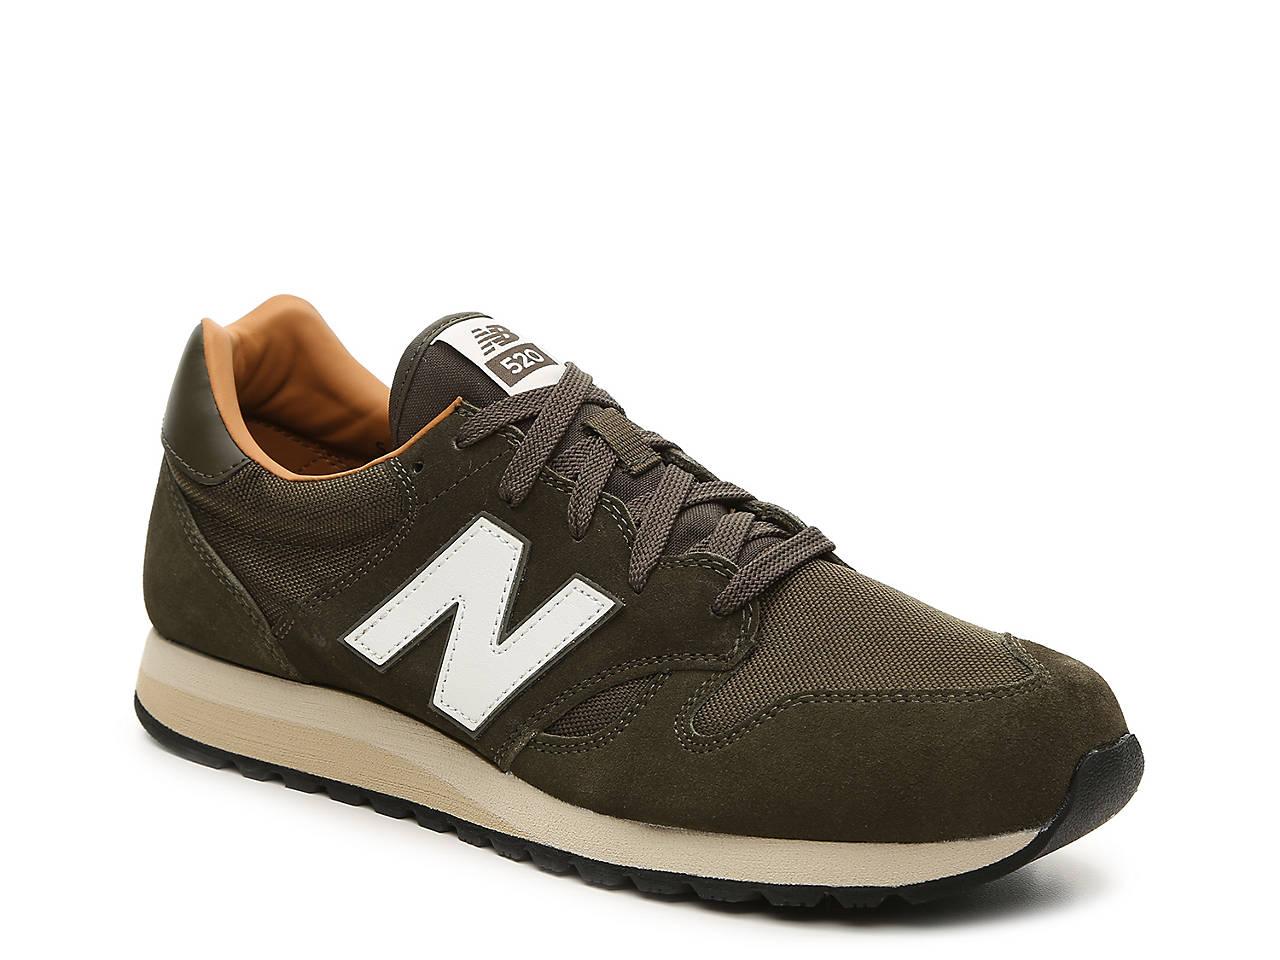 857 new balance shoes dsw